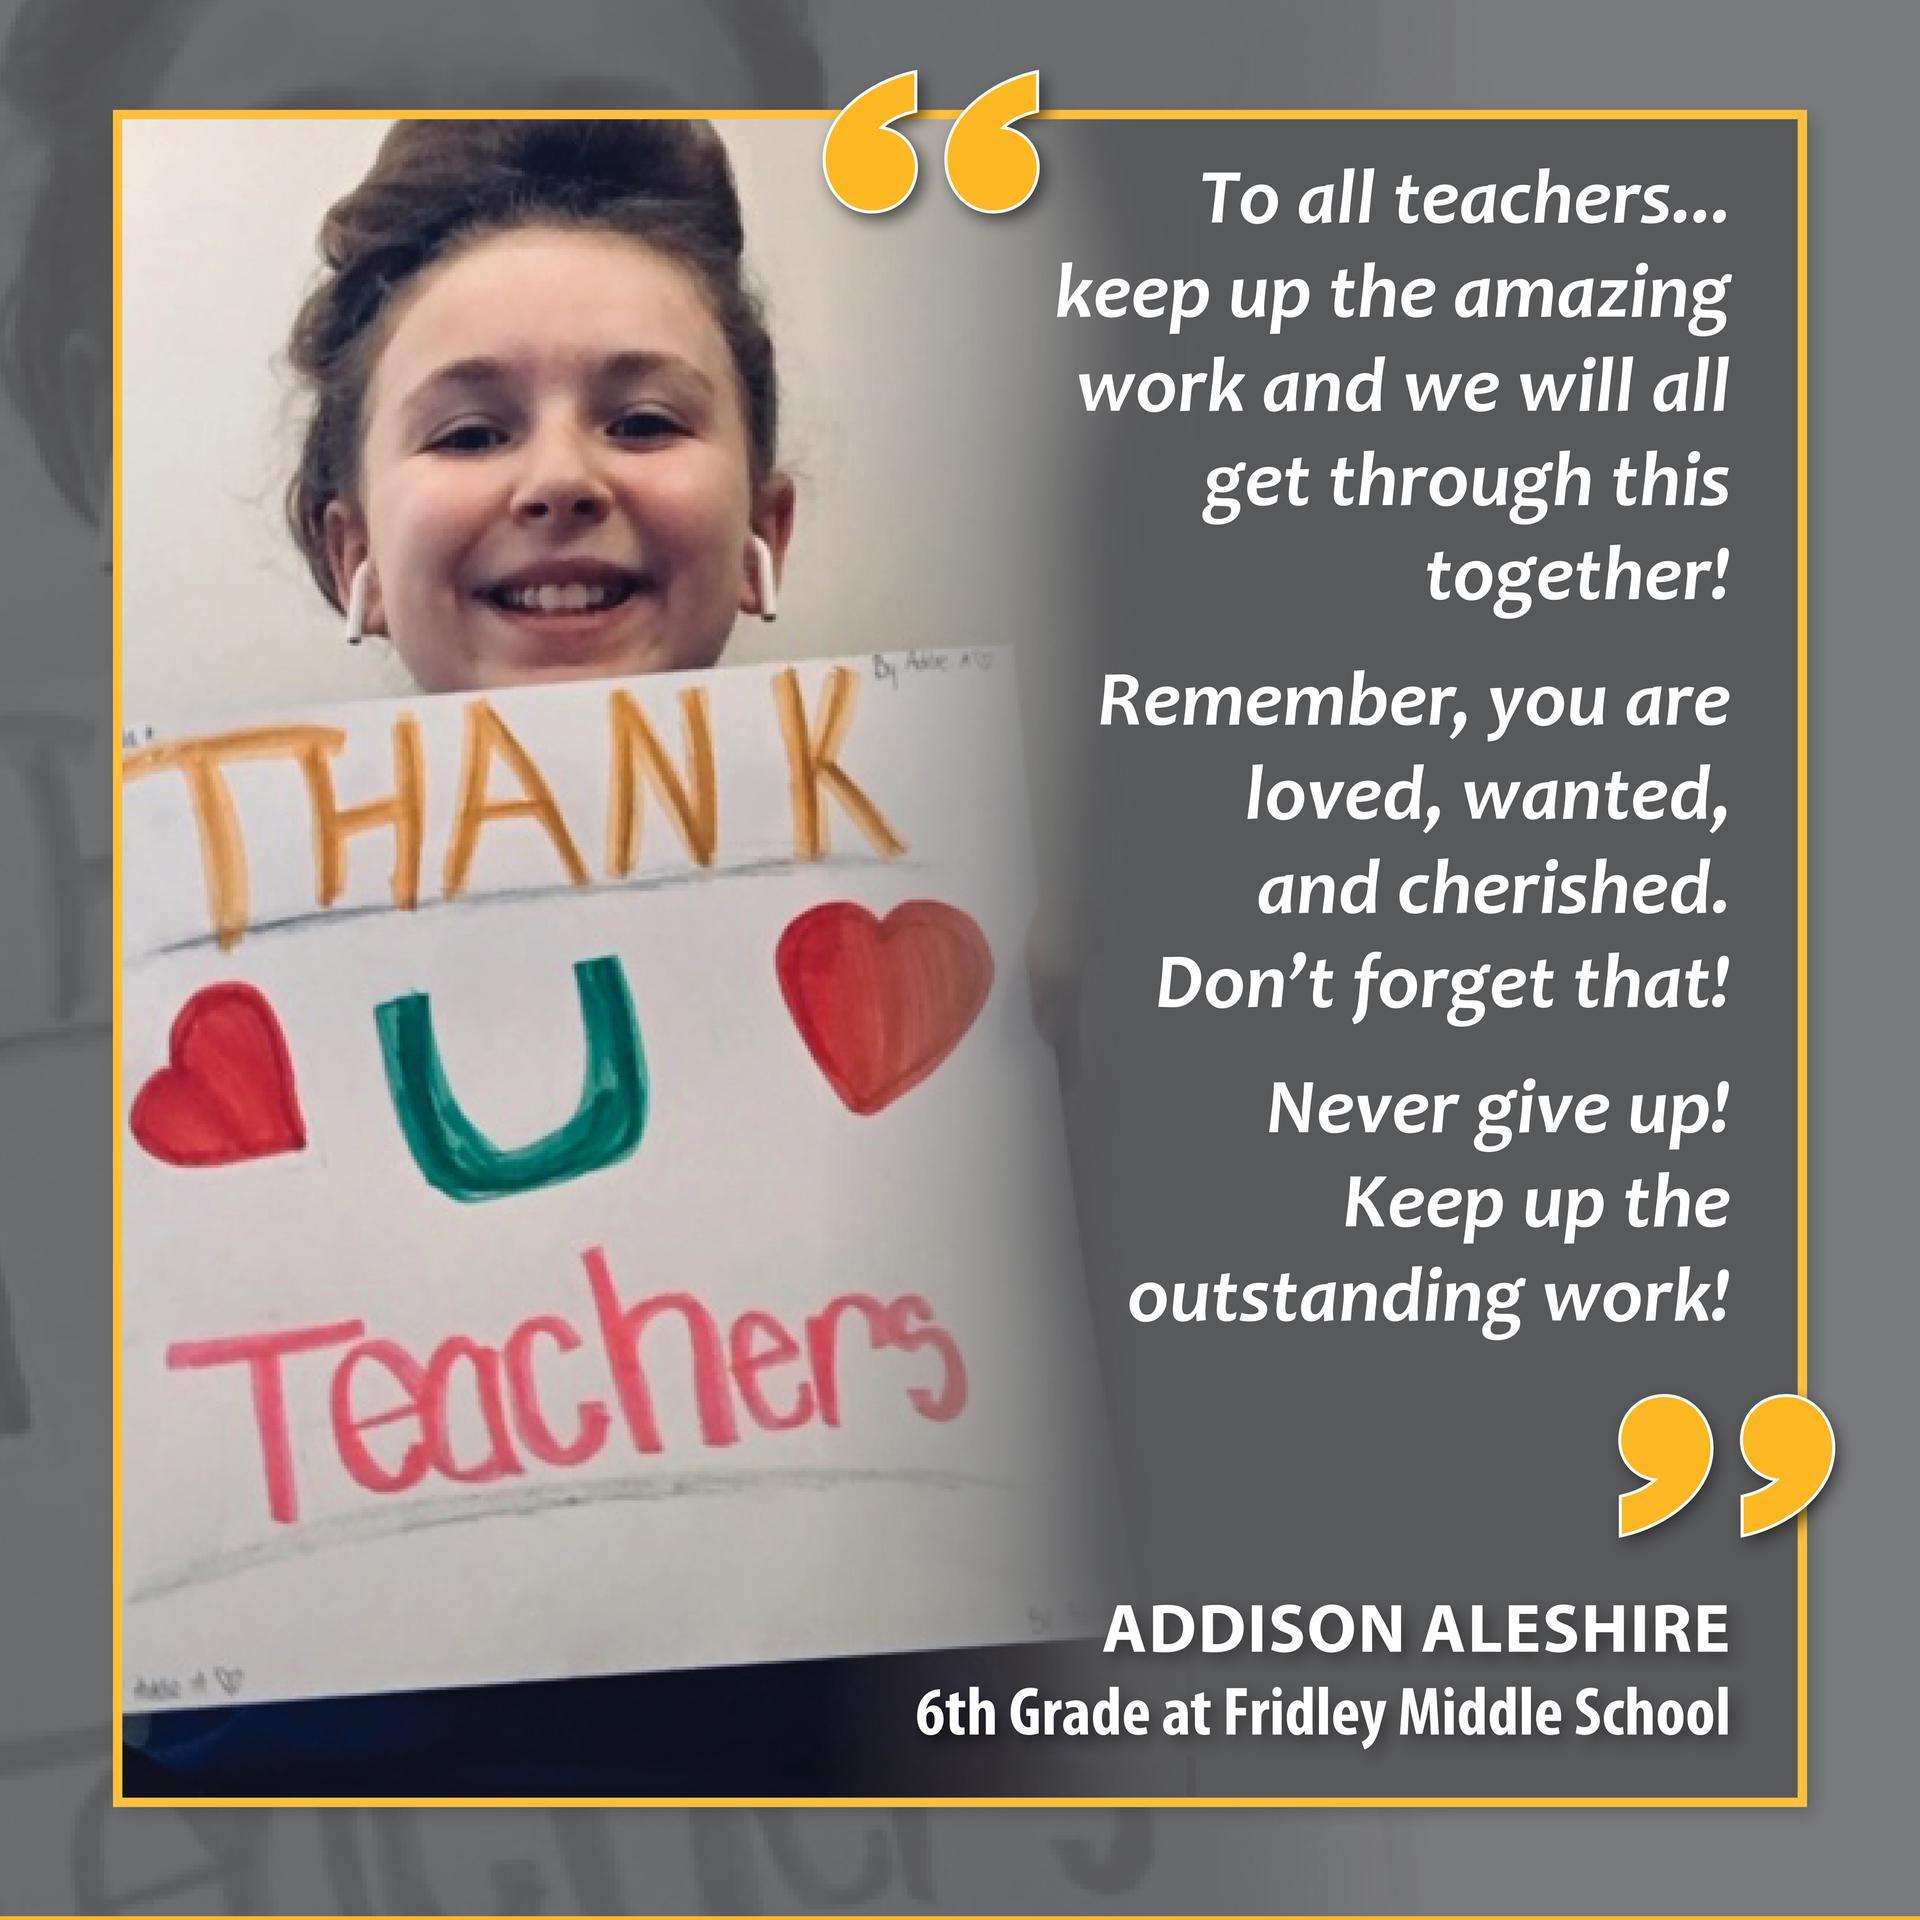 Addison Aleshire